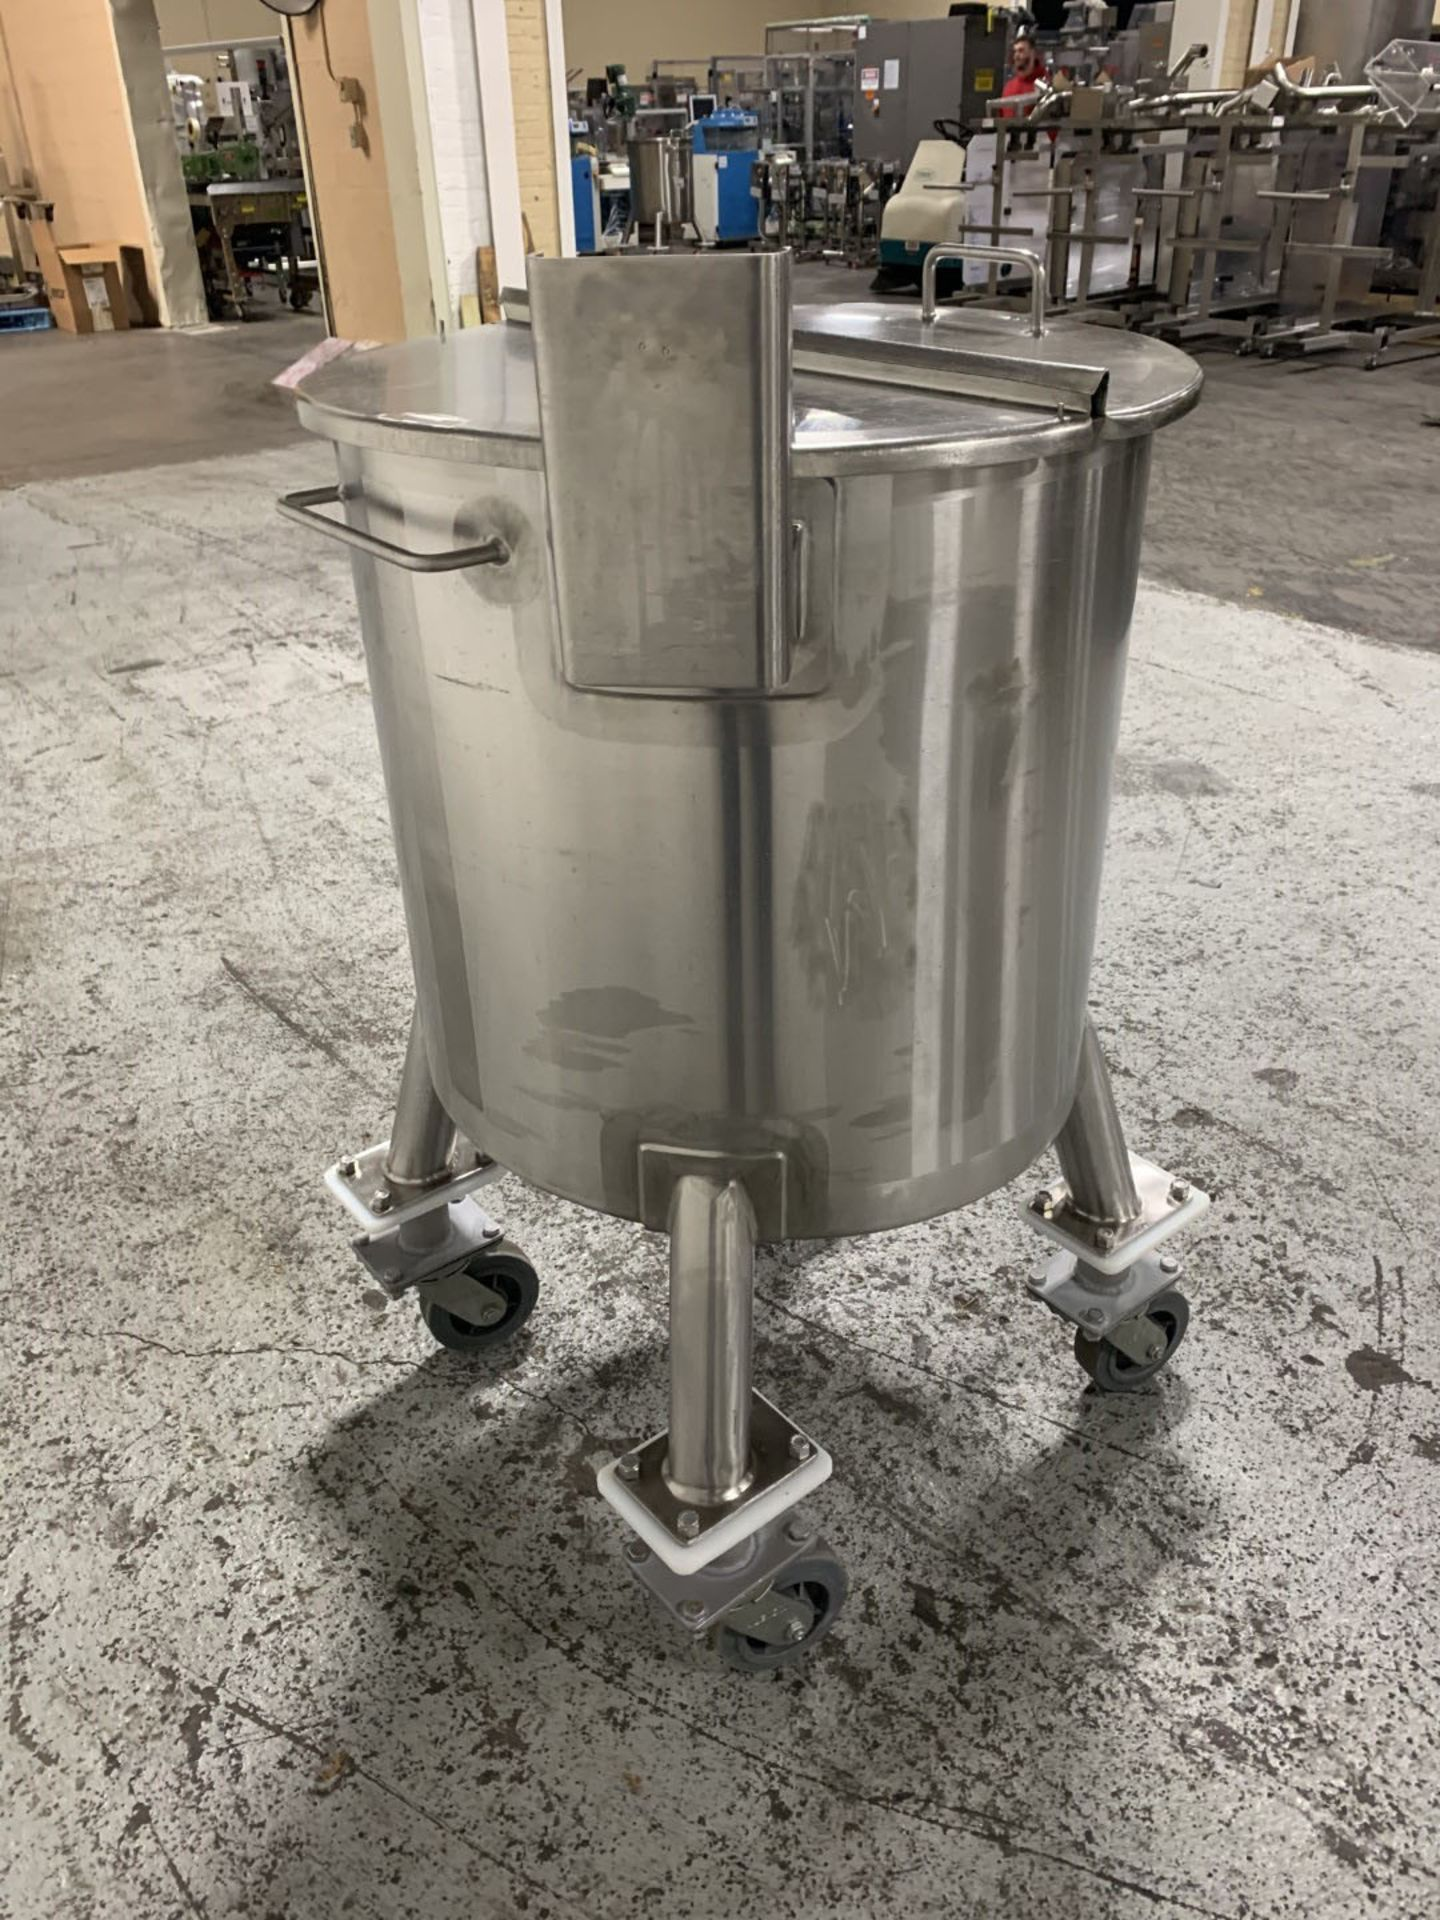 Lot 20 - 65 gallon Walker tank, 304 stainless steel construction